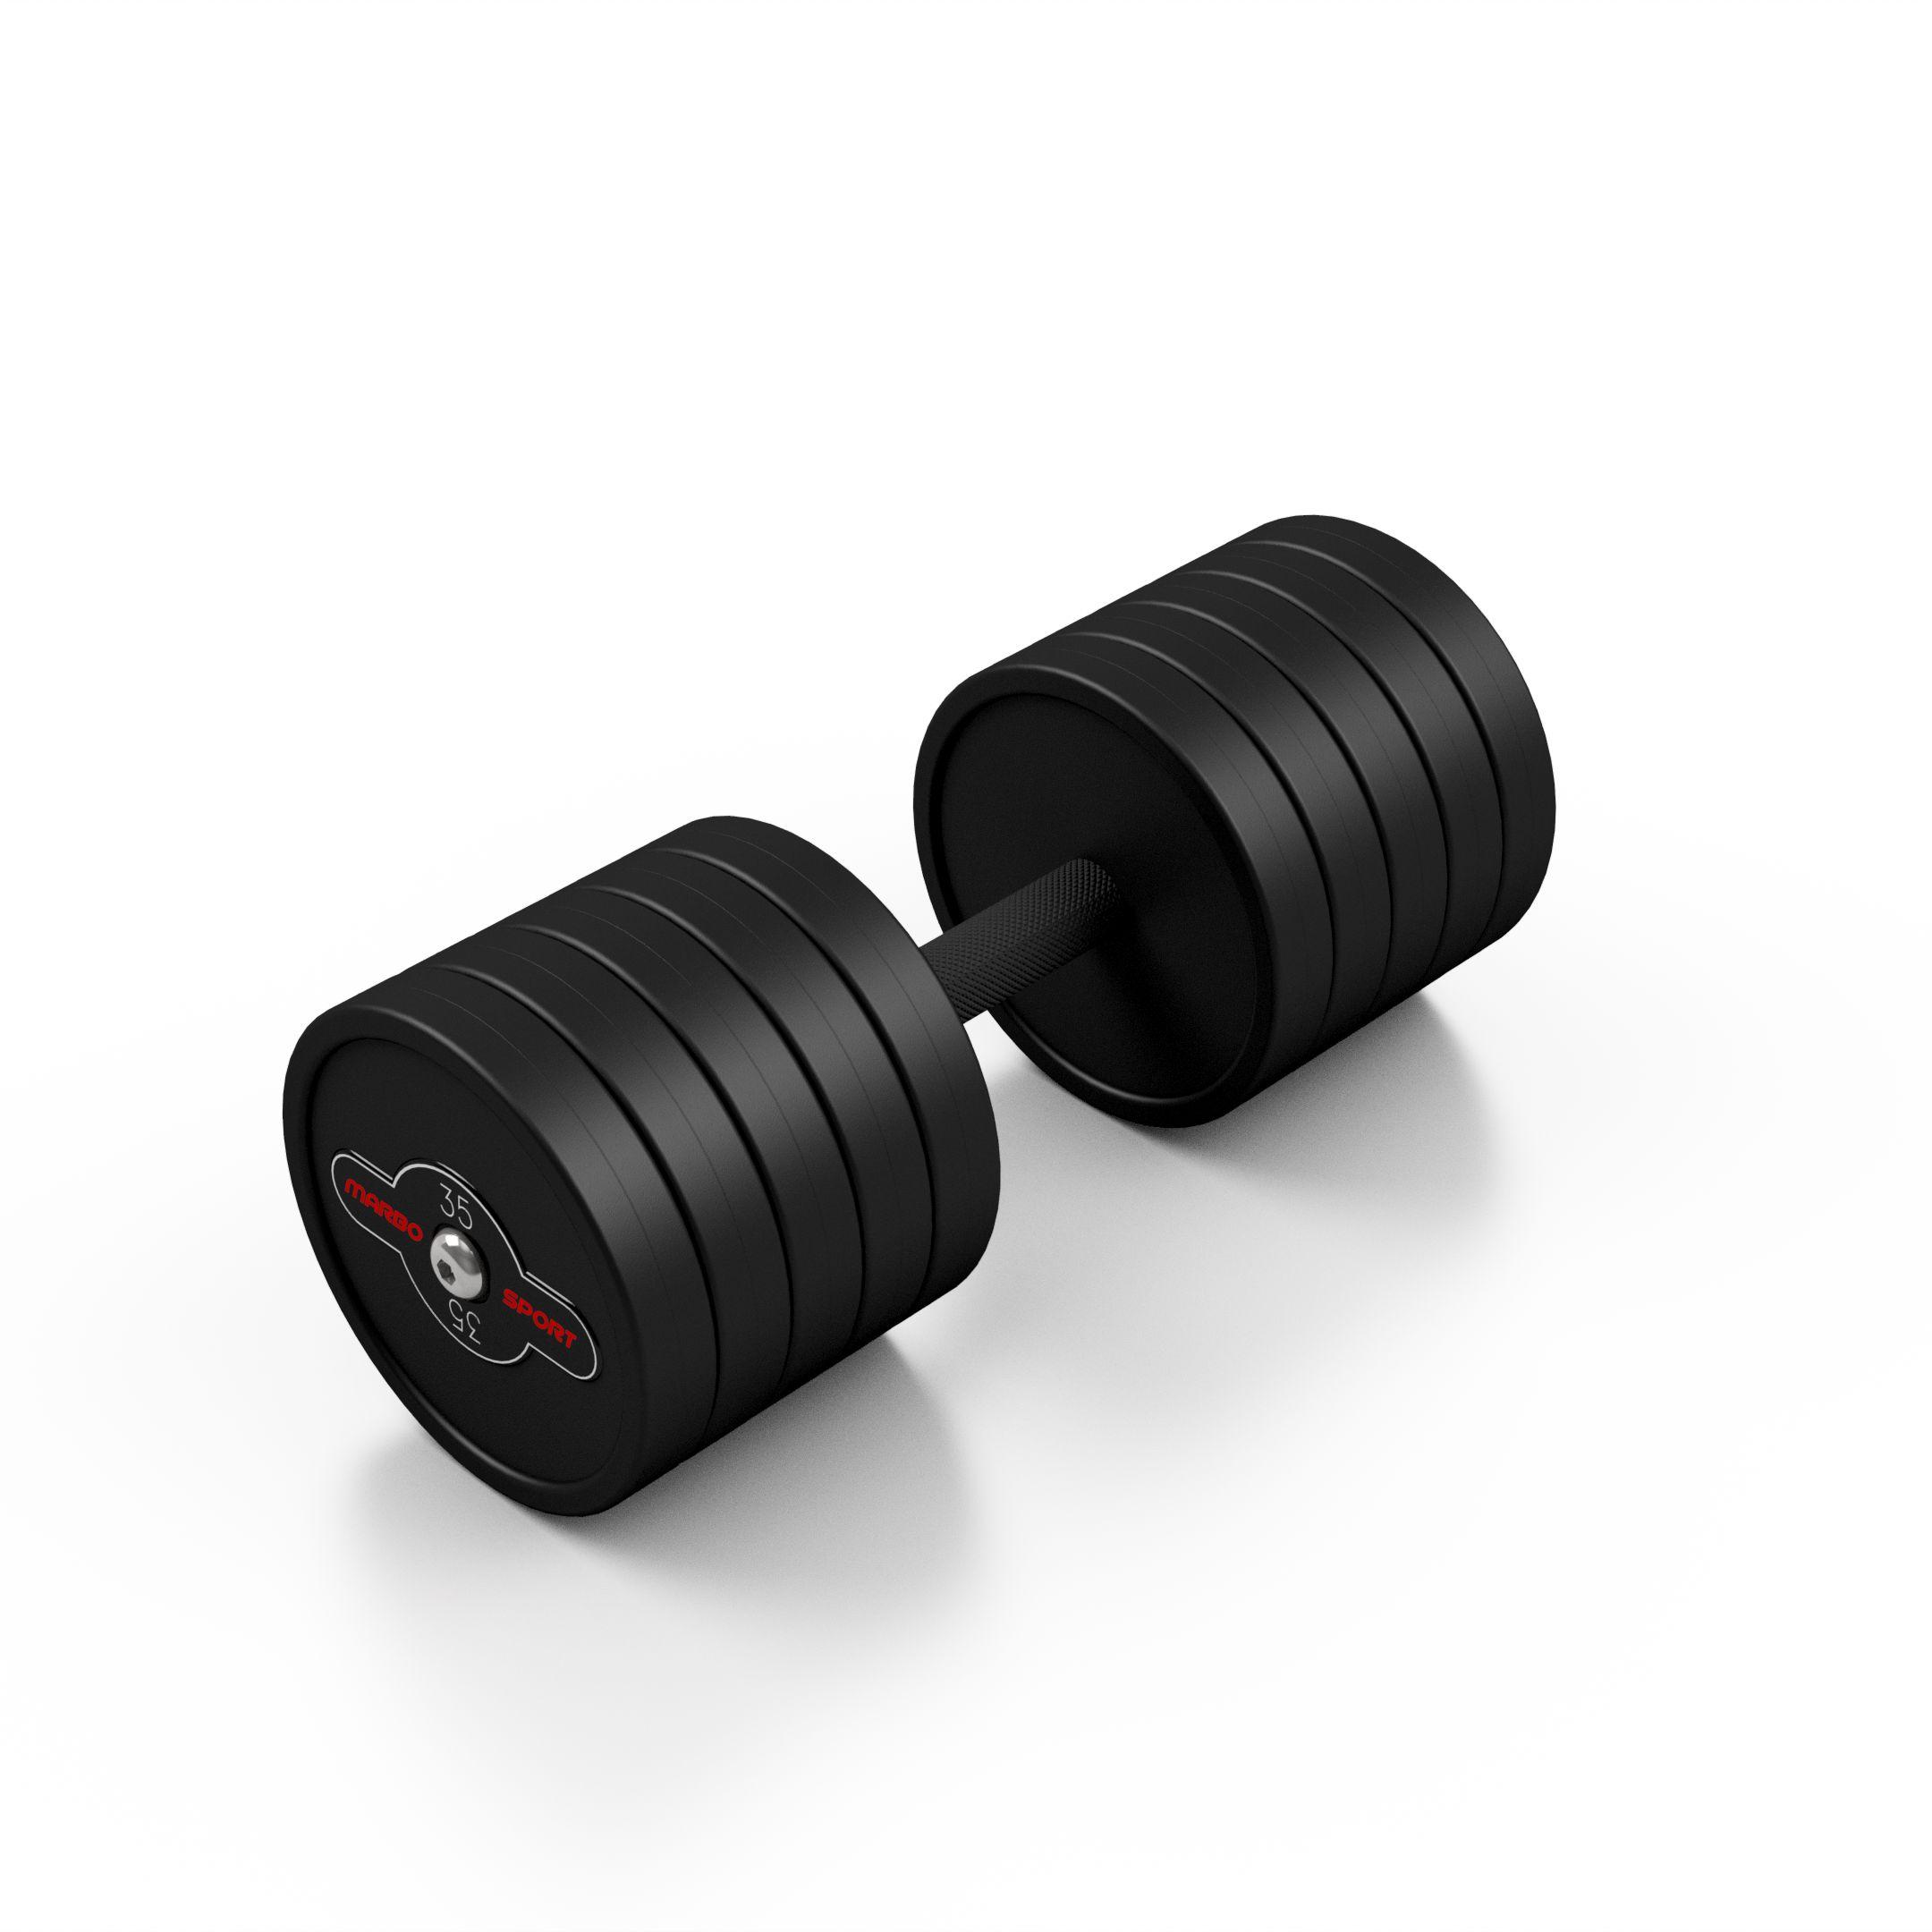 Hantla stalowa gumowana 35 kg czarny mat - Marbo Sport - 35 kg